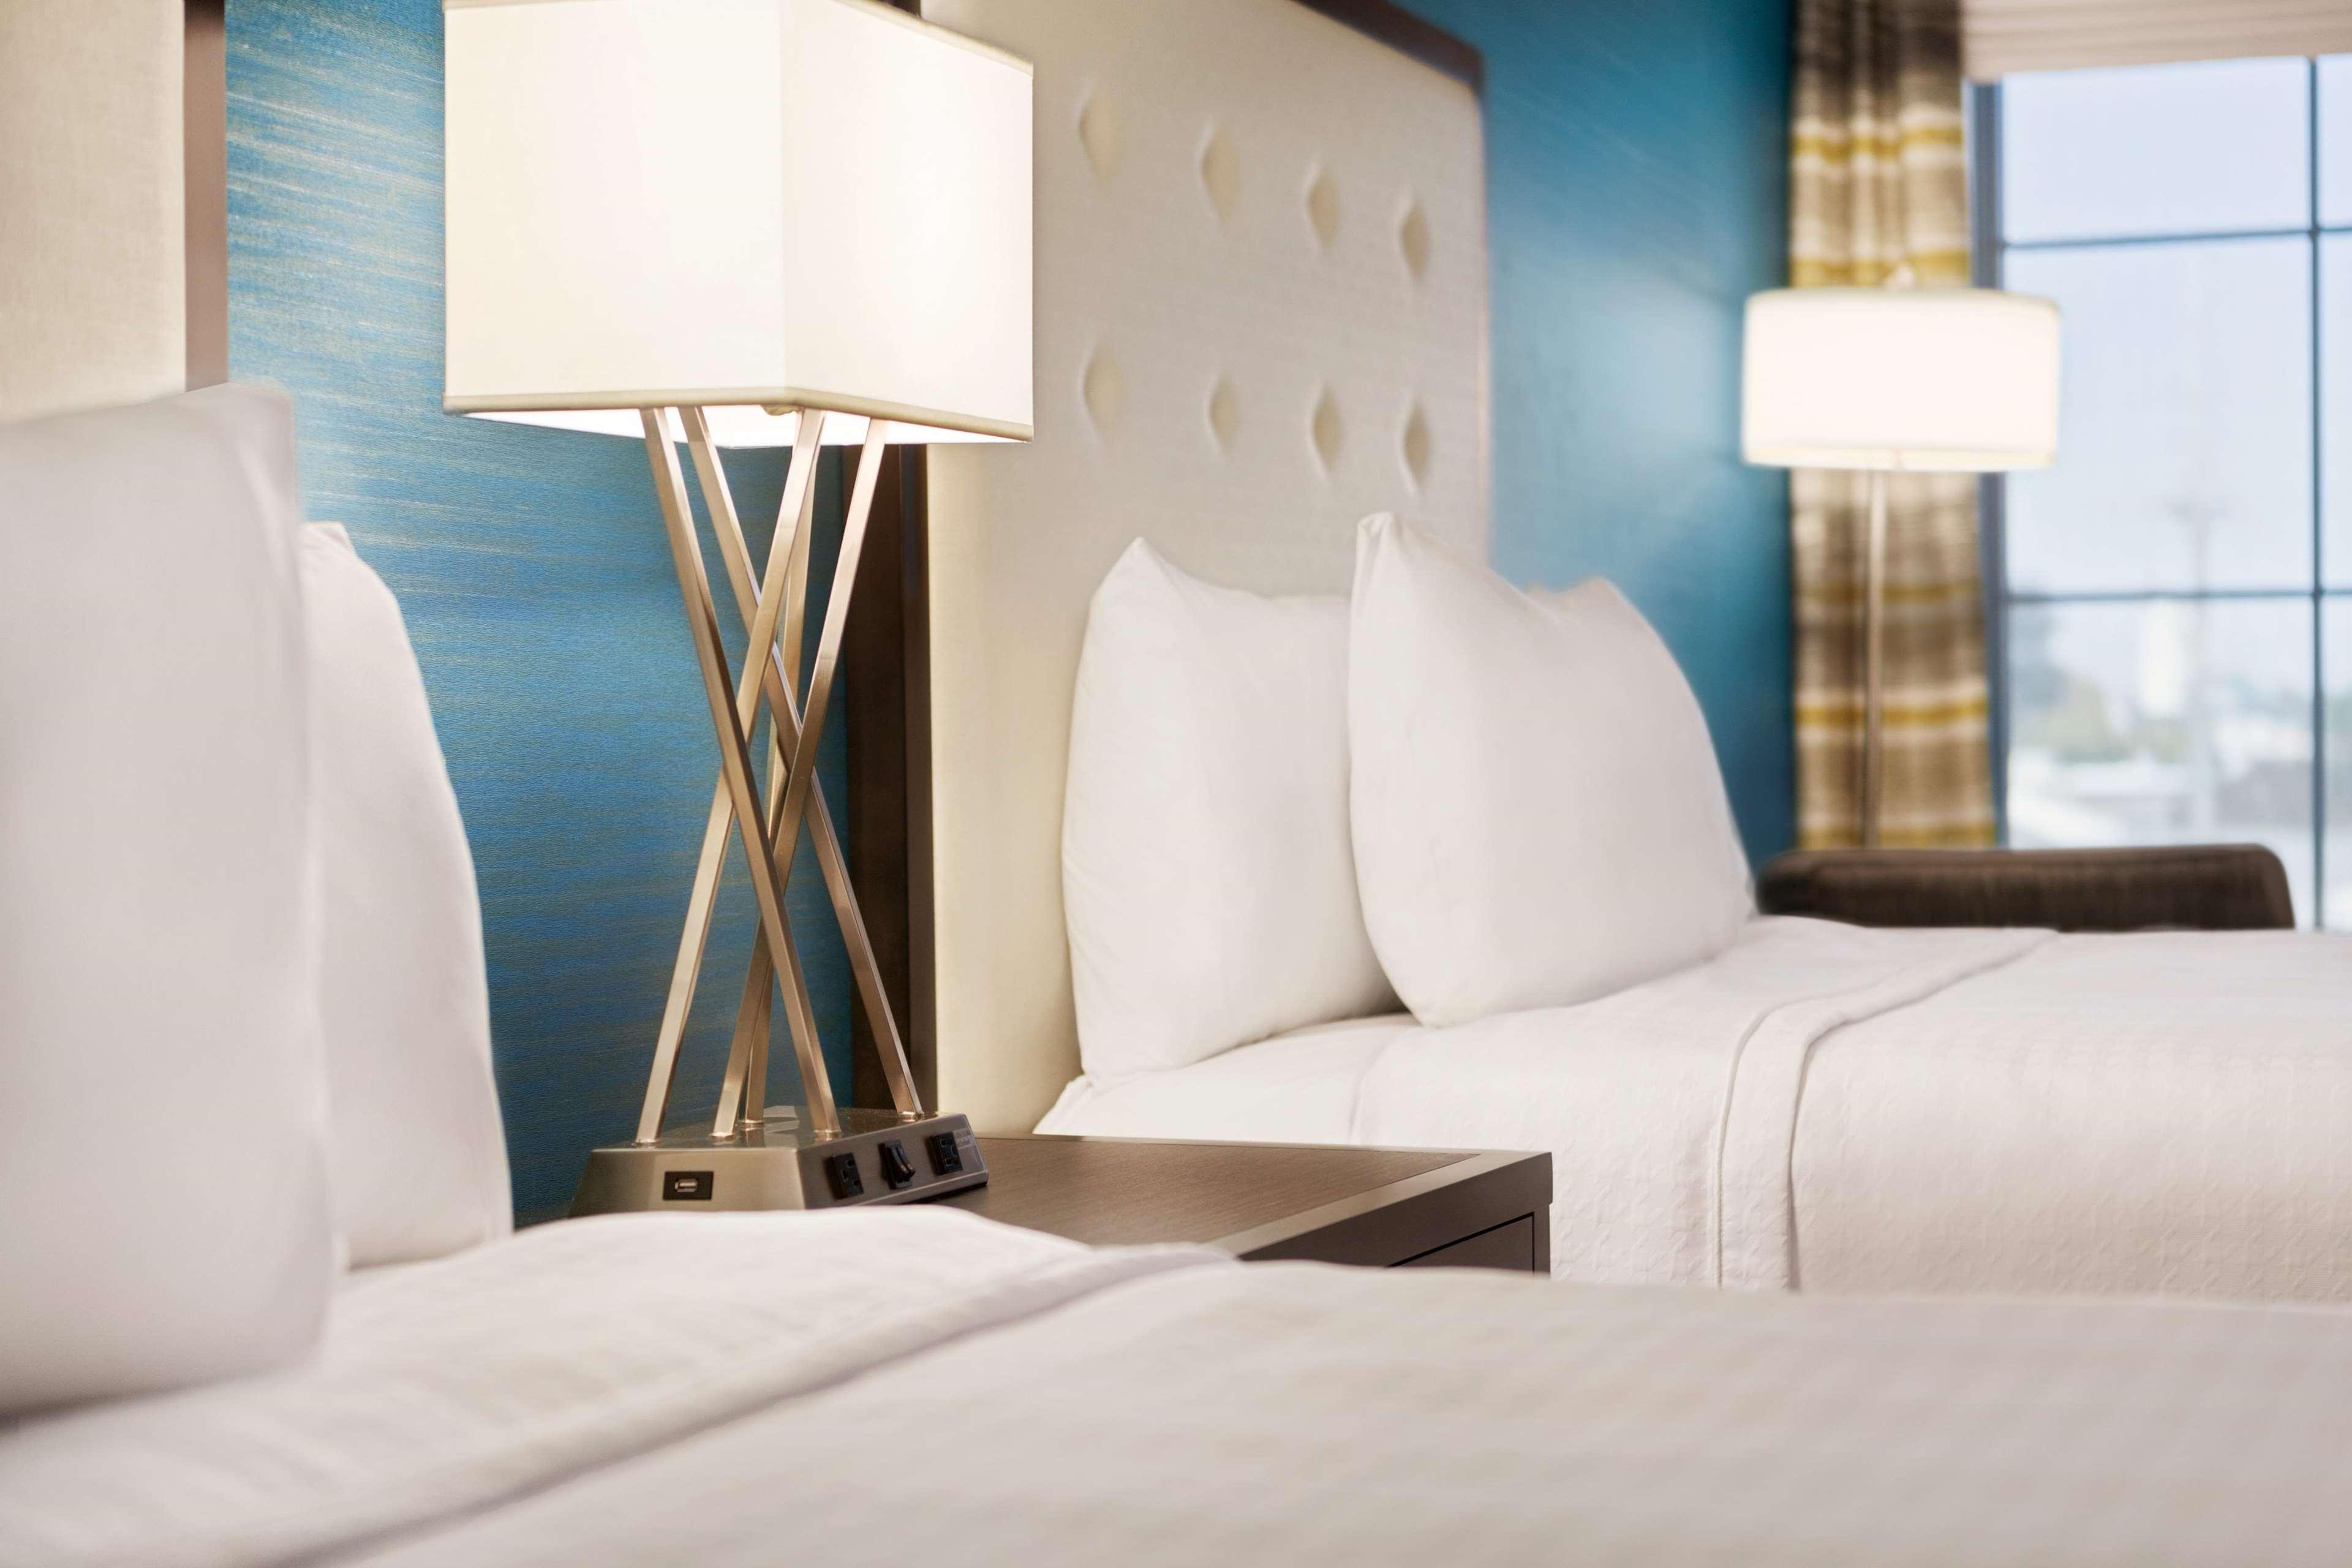 Homewood Suites by Hilton Charlotte/SouthPark image 8